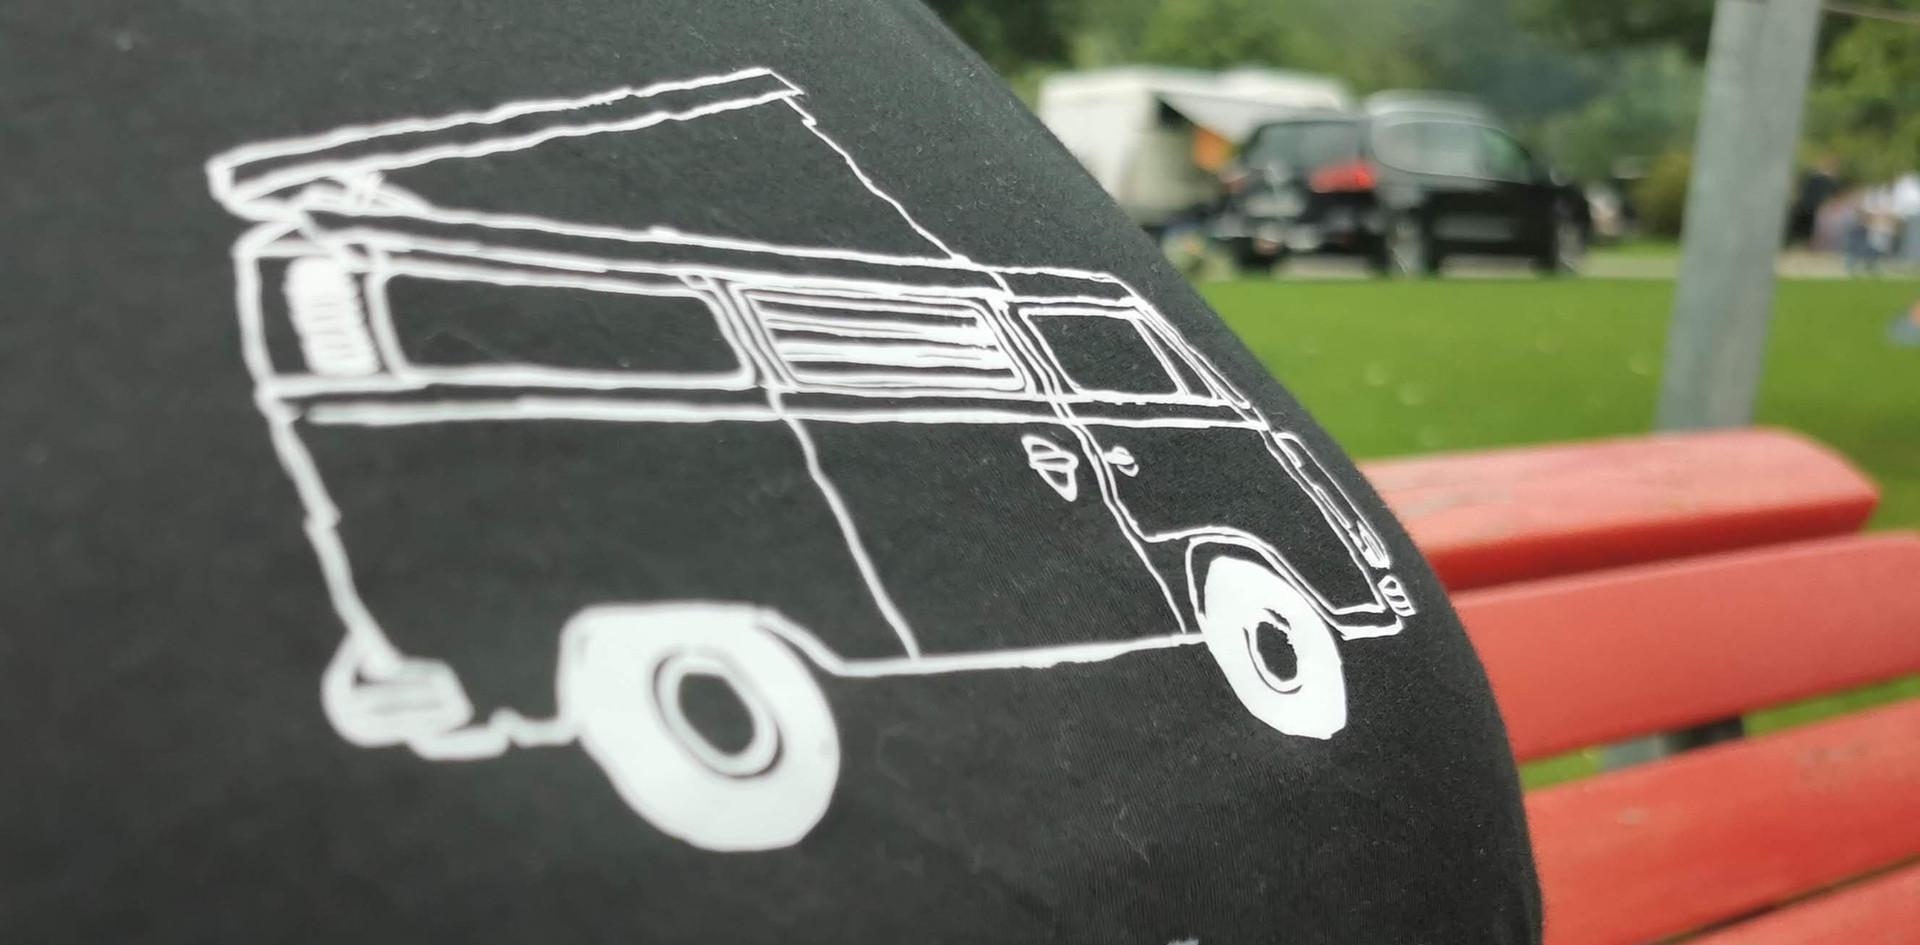 T2b Hubdach T-Shirt